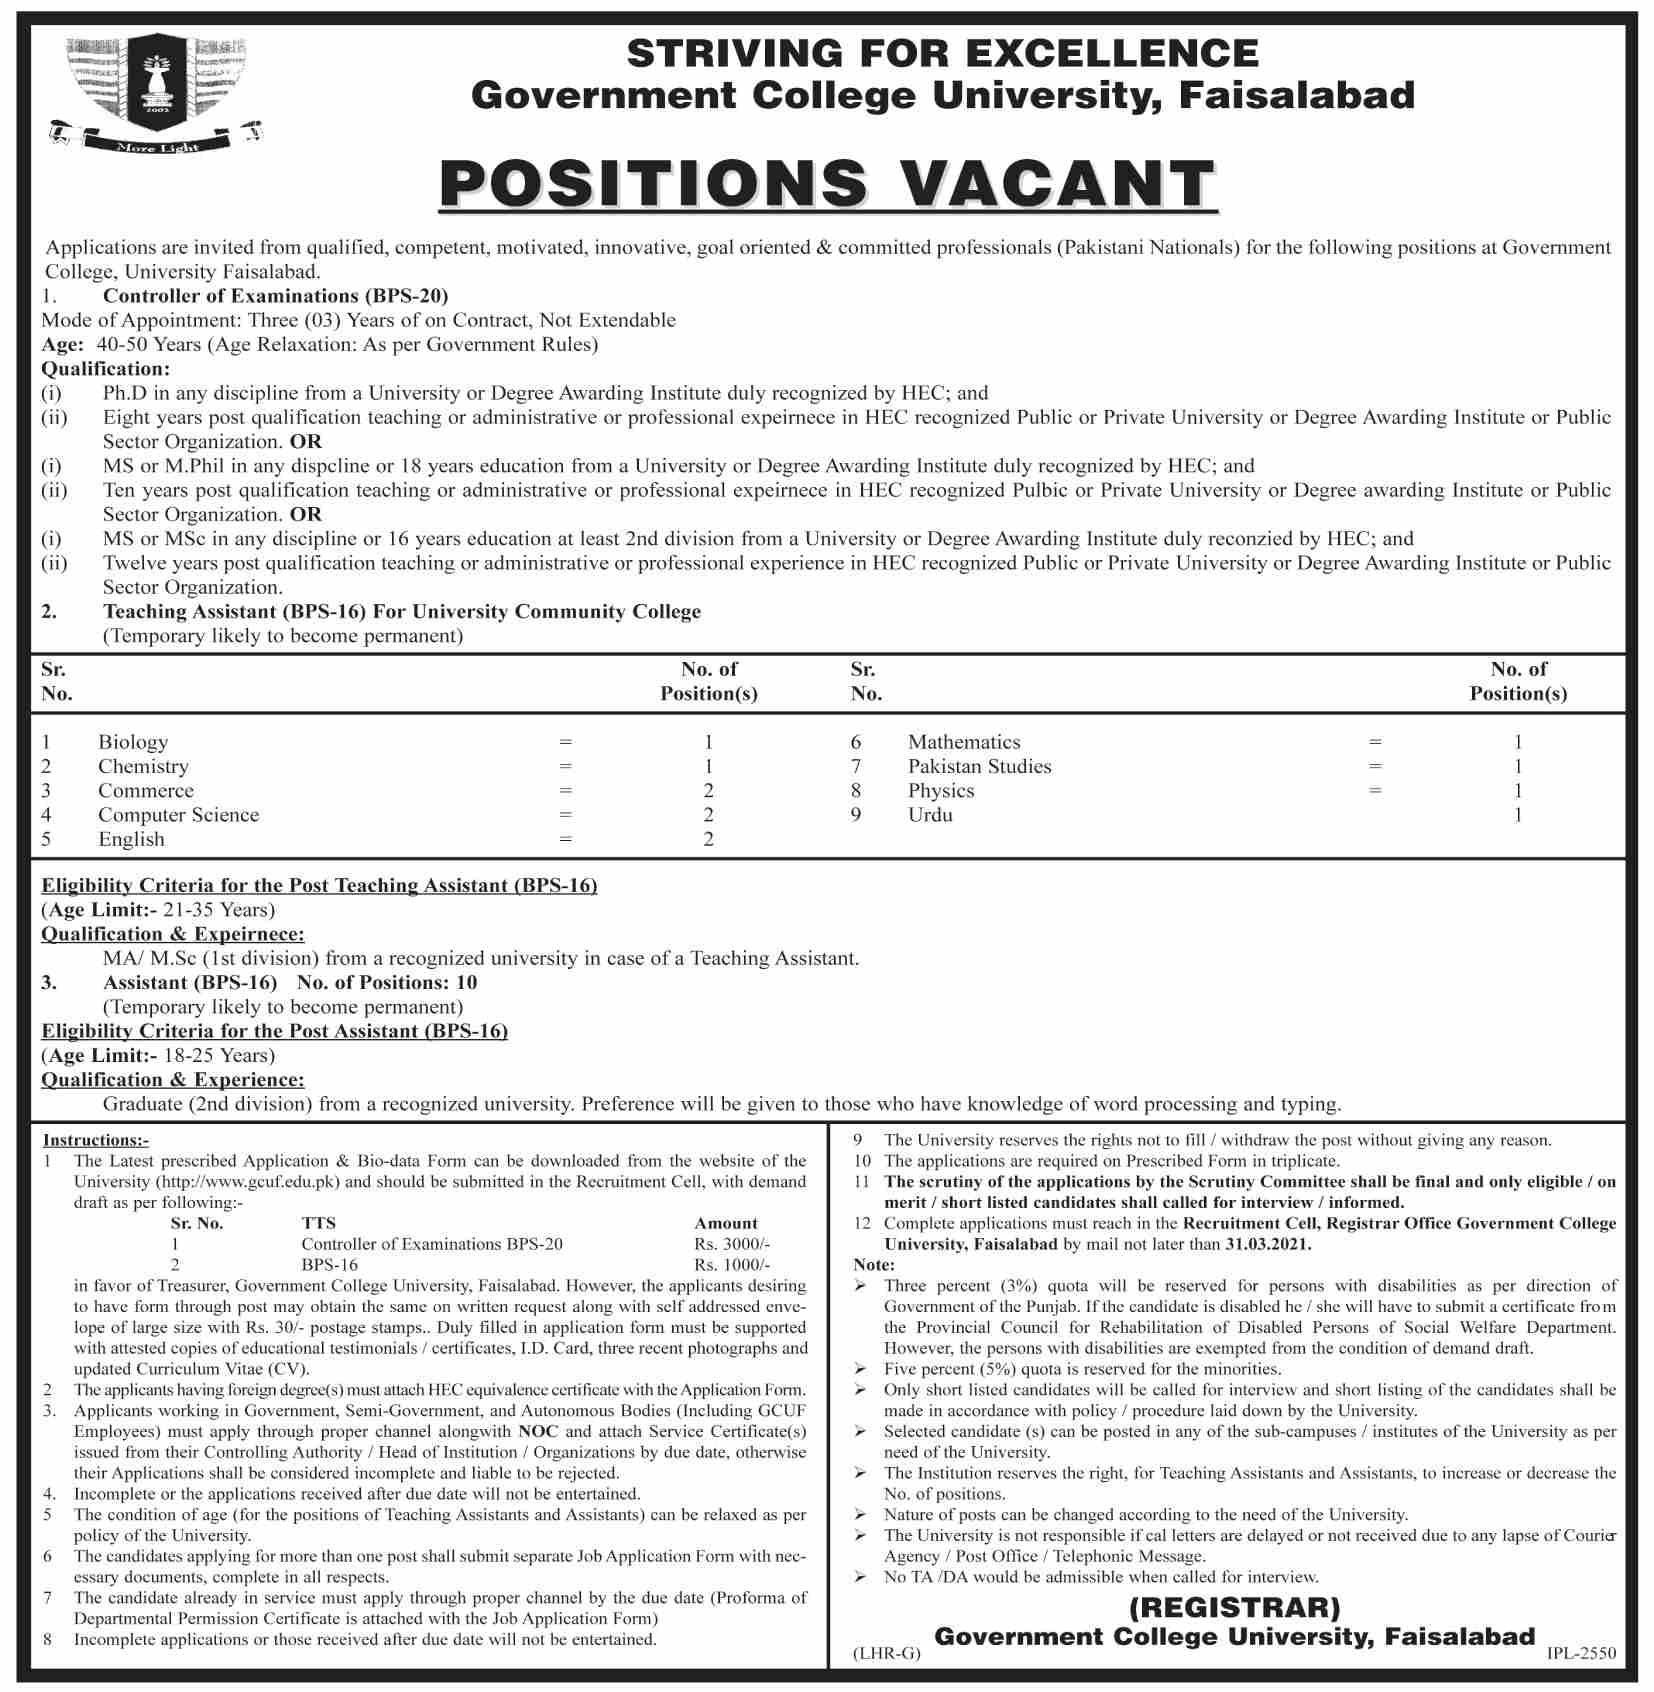 GCUF Jobs 2021 - GC Uni Jobs 2021 - GC University Fsd Jobs 2021 - GC University Faisalabad Job Vacancy - Government College University Faisalabad Jobs 2021